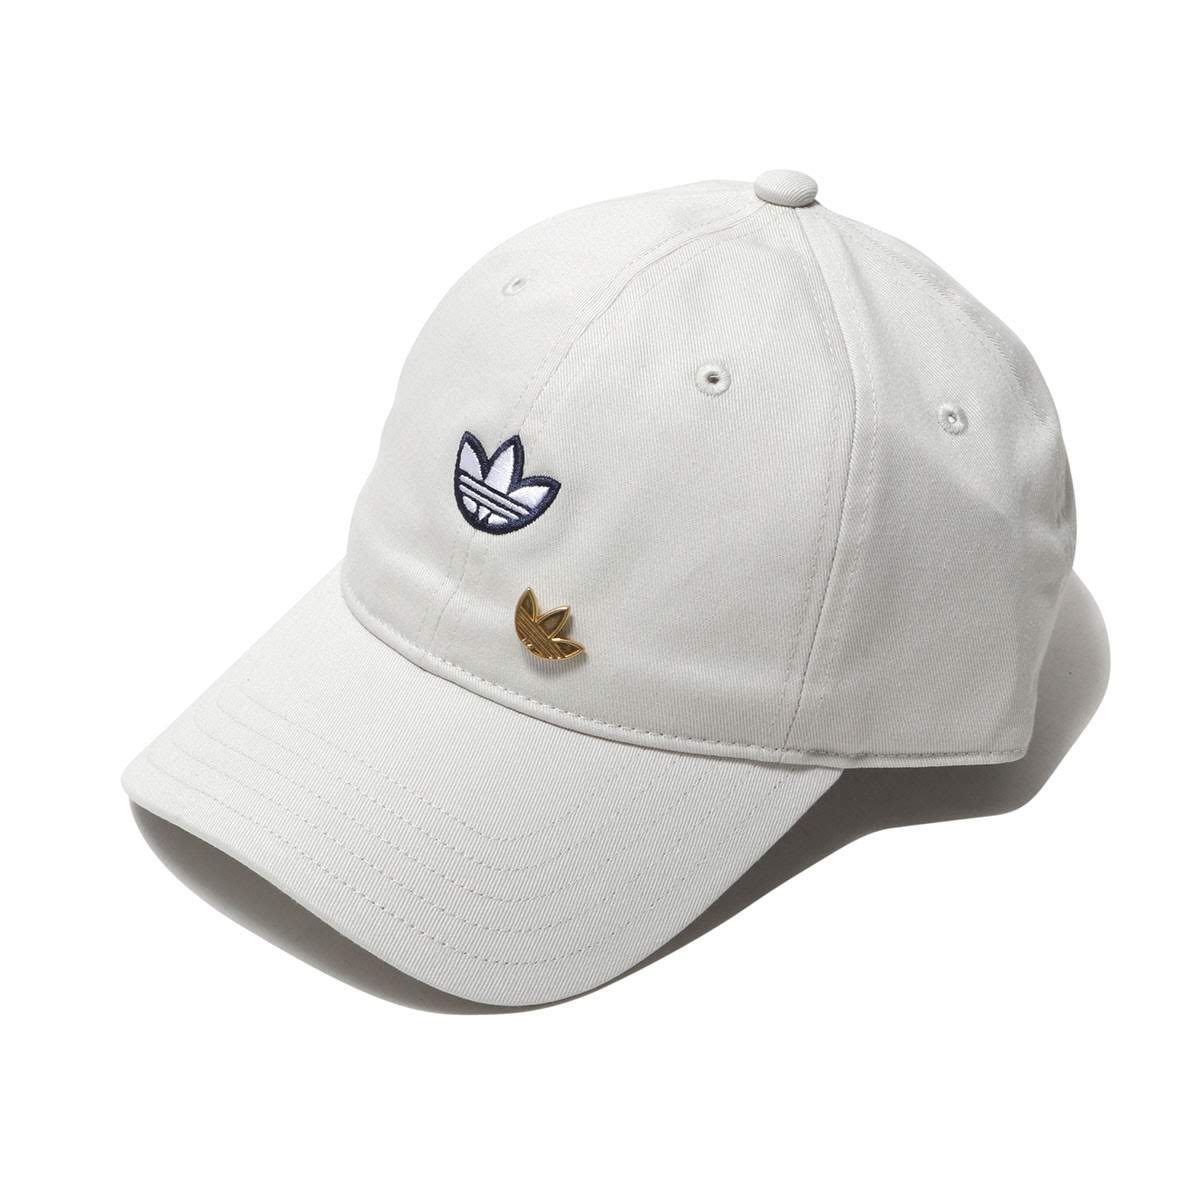 b82a9699476 adidas Originals SAMSTAG DAD CAP (RAW WHITE WHITE GOLDMET)  (アディダスオリジナルスサムスタグダッドキャップ)